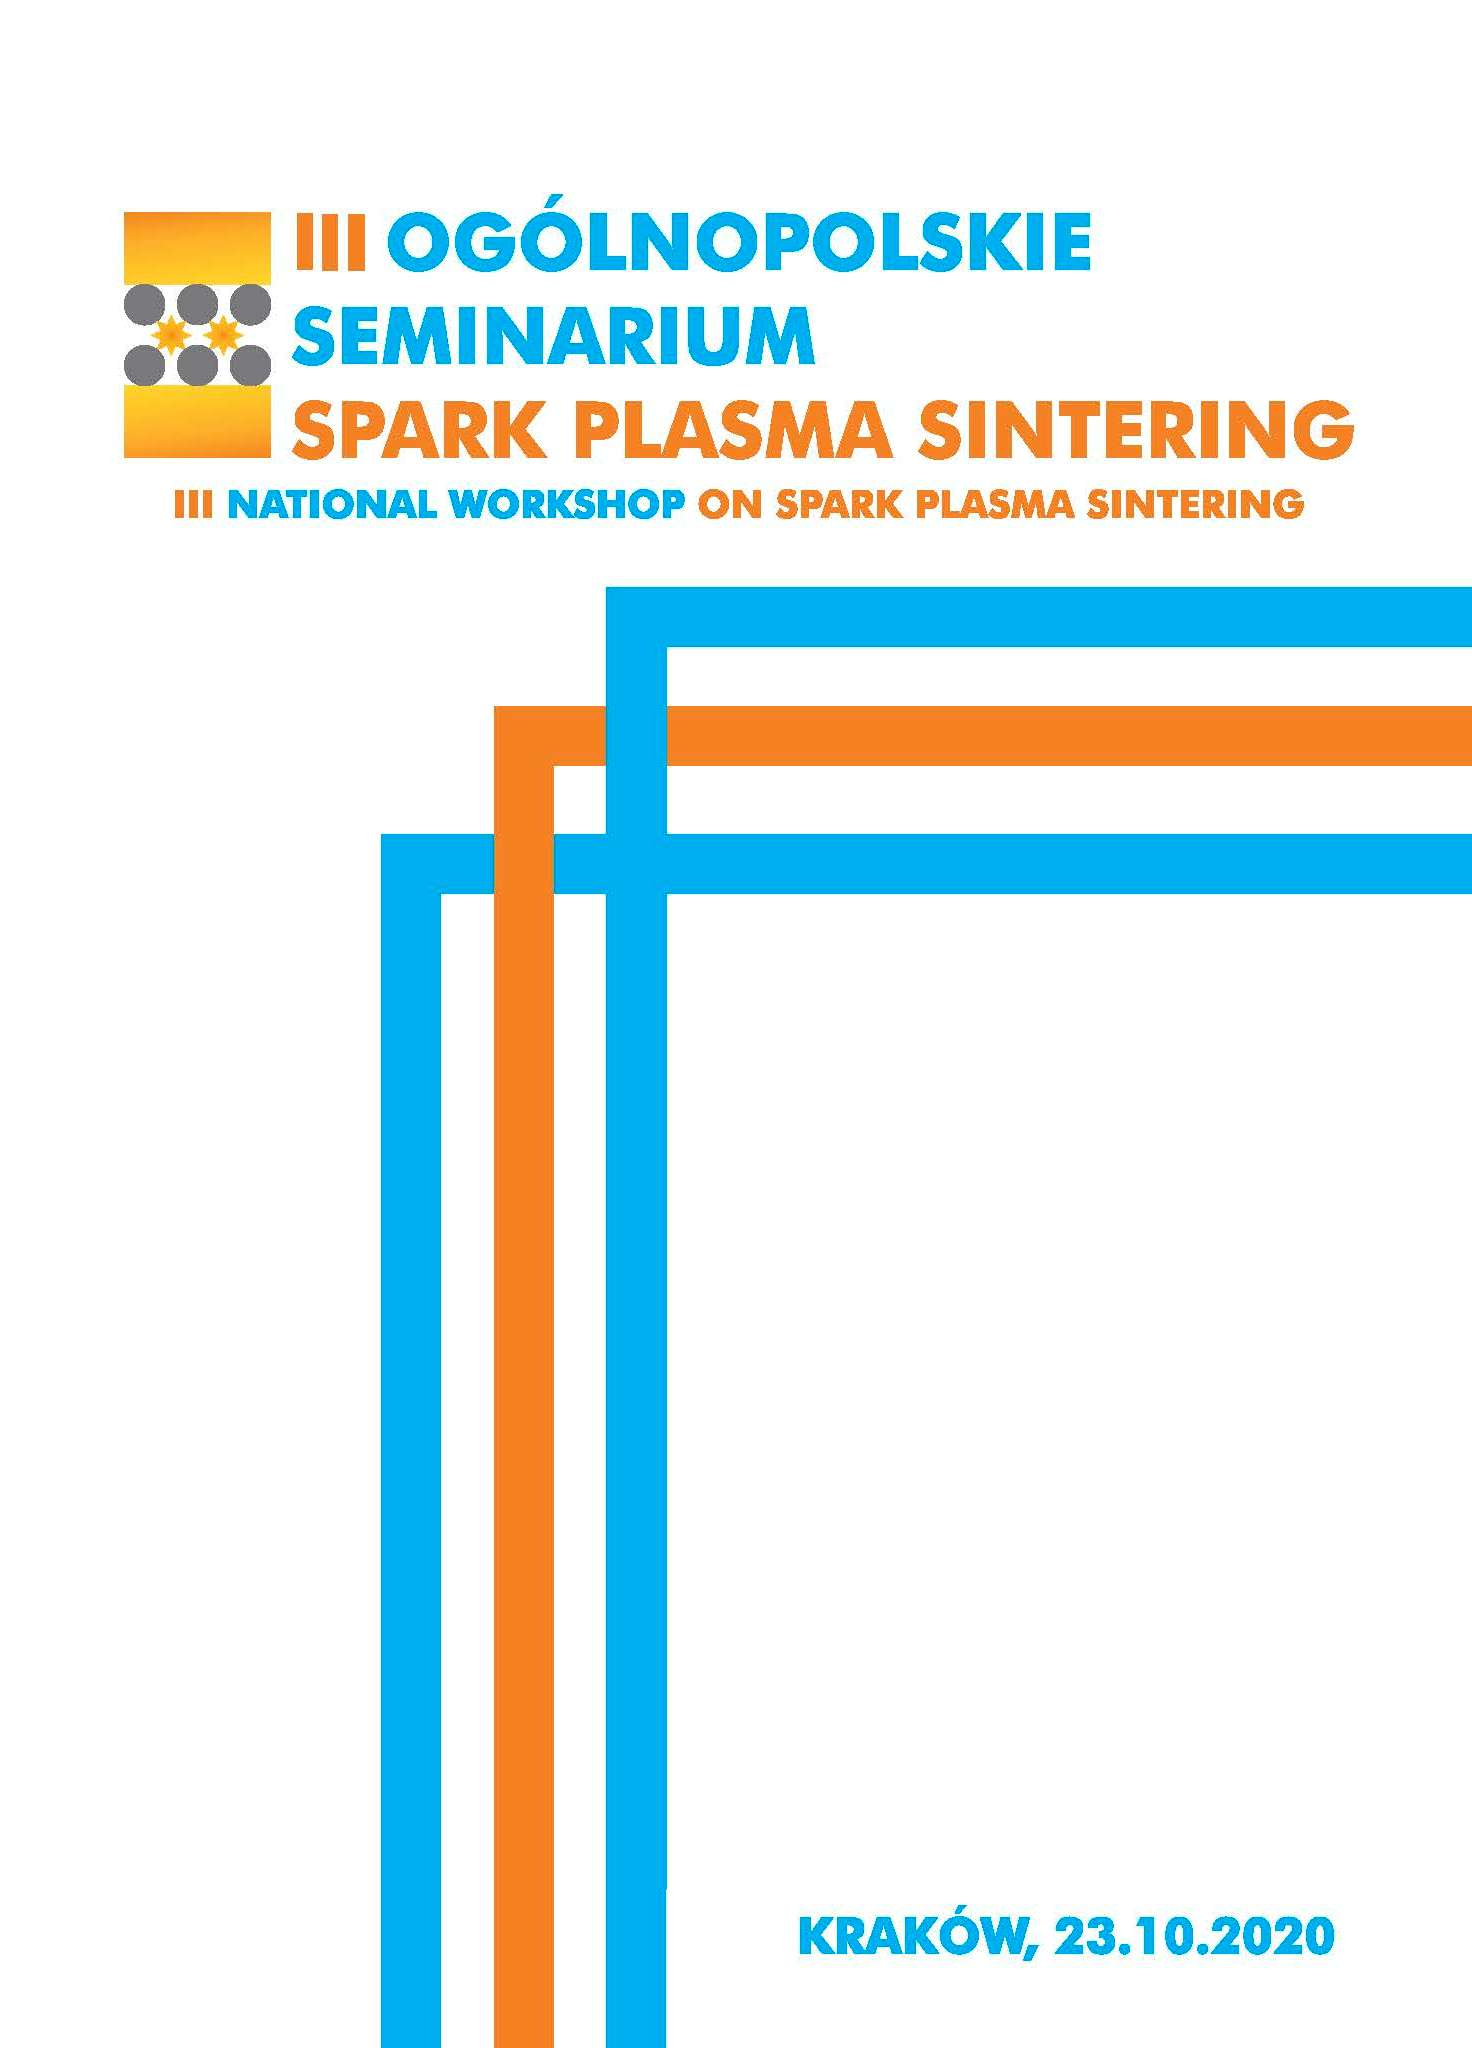 III National Workshop on Spark Plasma Sintering